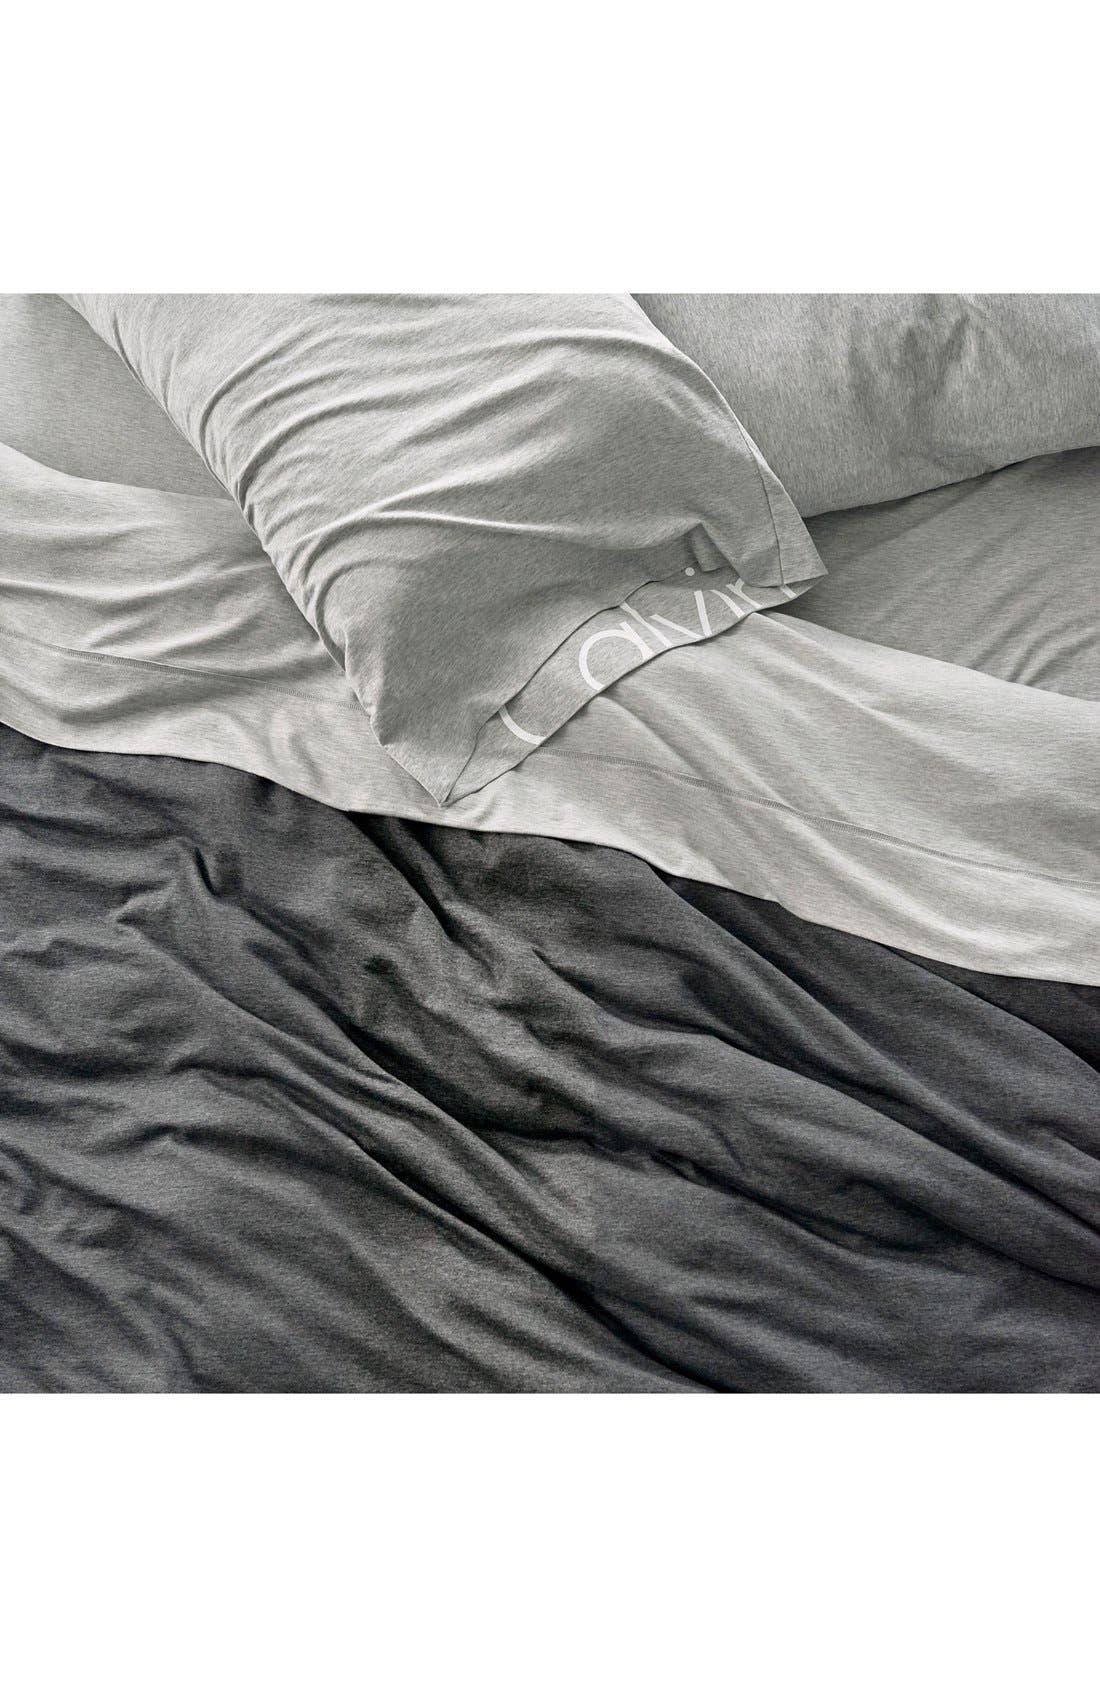 CALVIN KLEIN HOME, Modern Cotton Collection Cotton & Modal Fitted Sheet, Alternate thumbnail 4, color, GREY